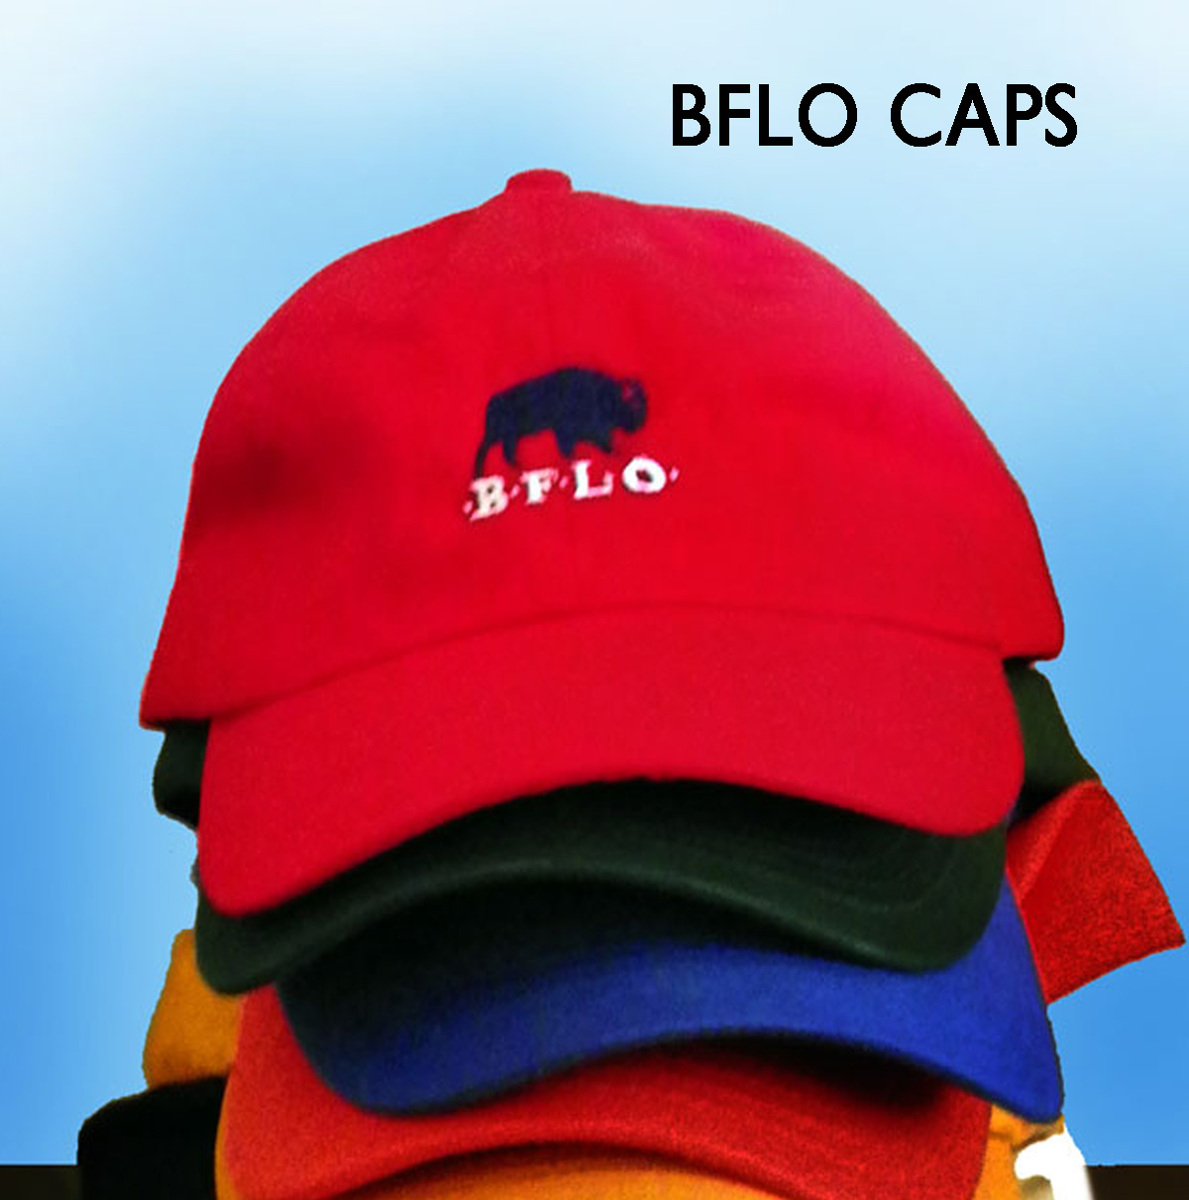 BFLO CAPS (large view)